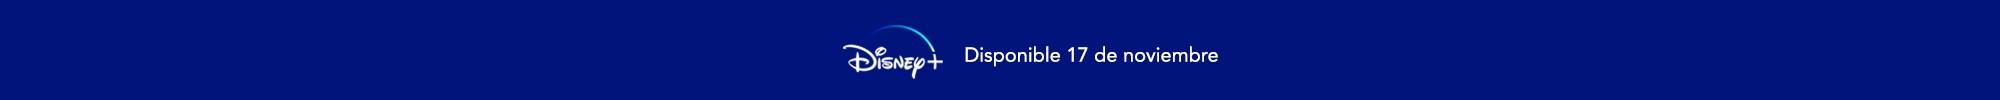 Homebar disneyplus slider